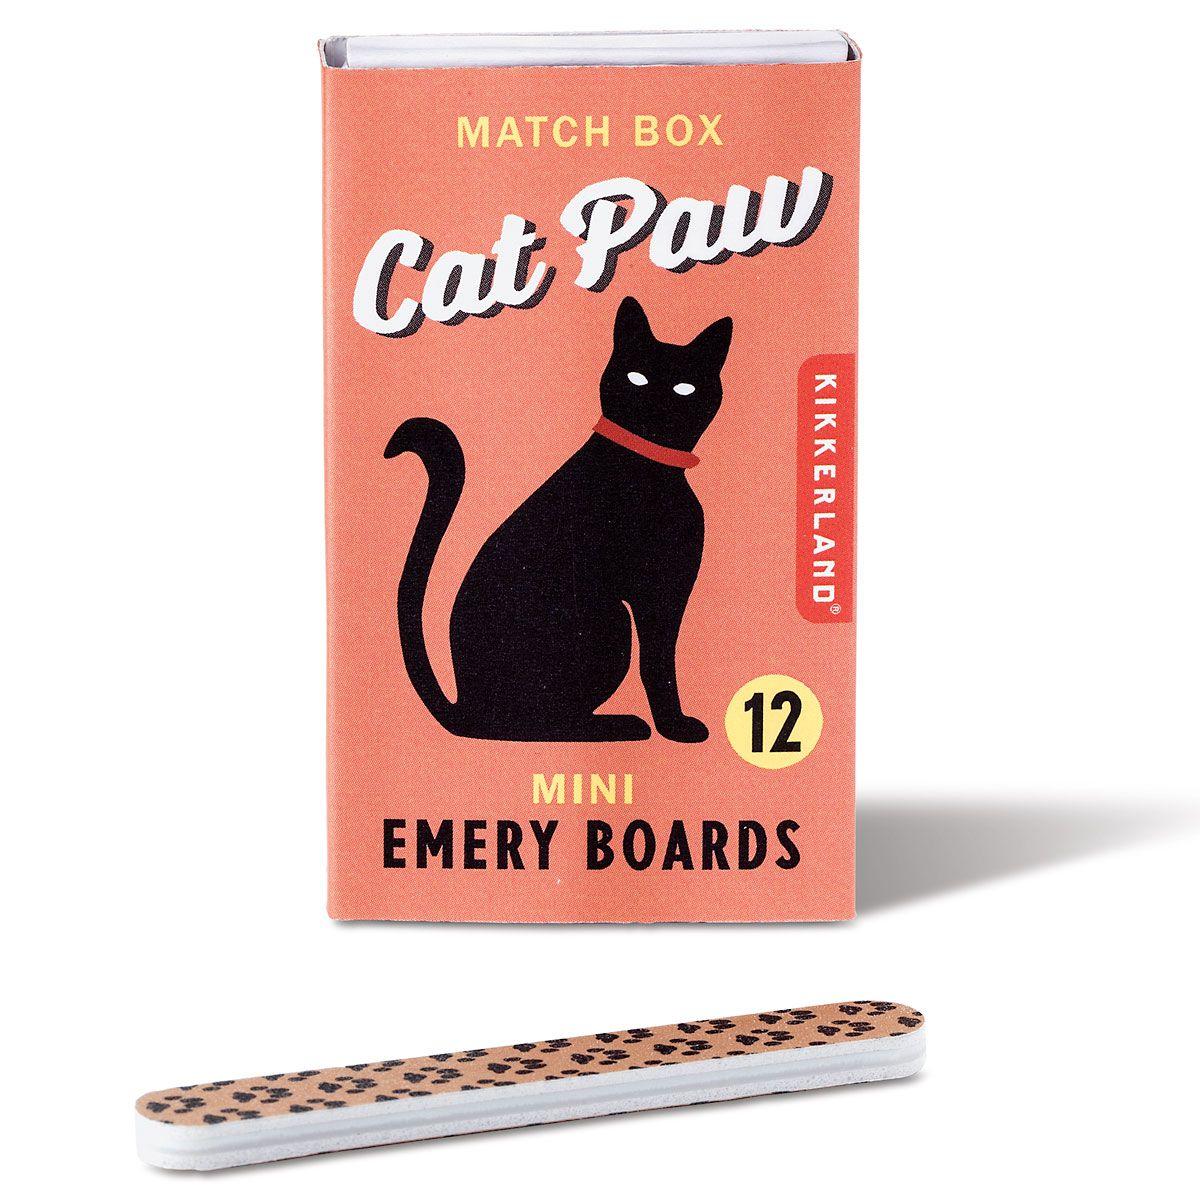 Match Box Emery Boards - Cat Paw